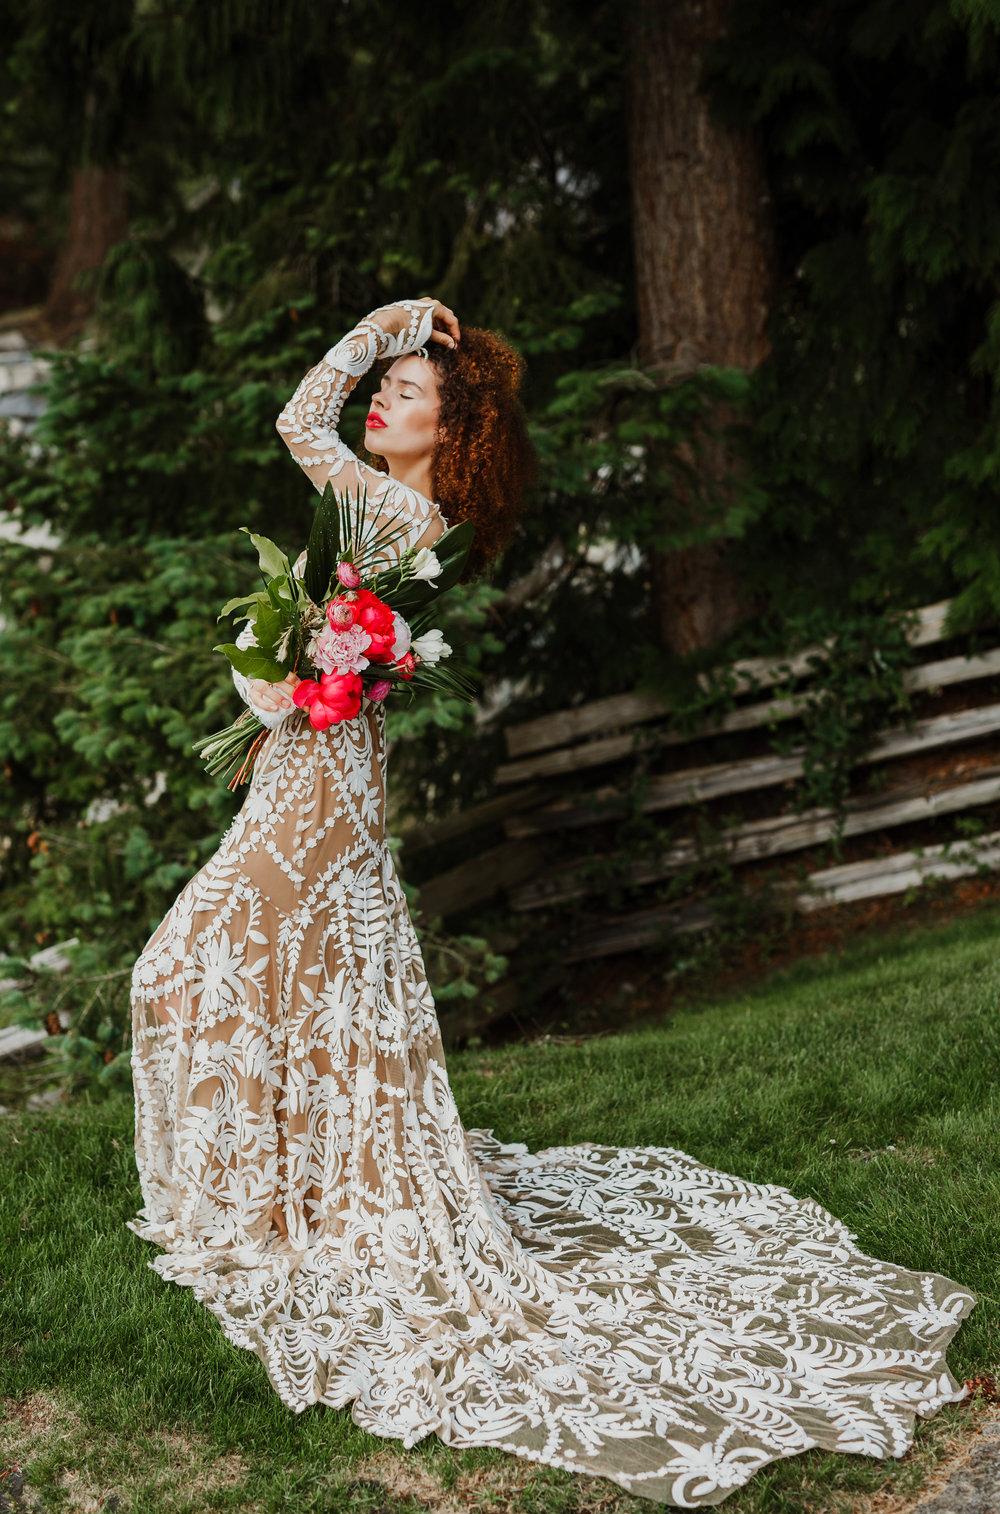 West Coast Bride - Vancouver Wedding Photographer & Videographer - Sunshine Coast Wedding Photos - Sunshine Coast Wedding Photographer - Jennifer Picard Photography - IMG_7250.jpg